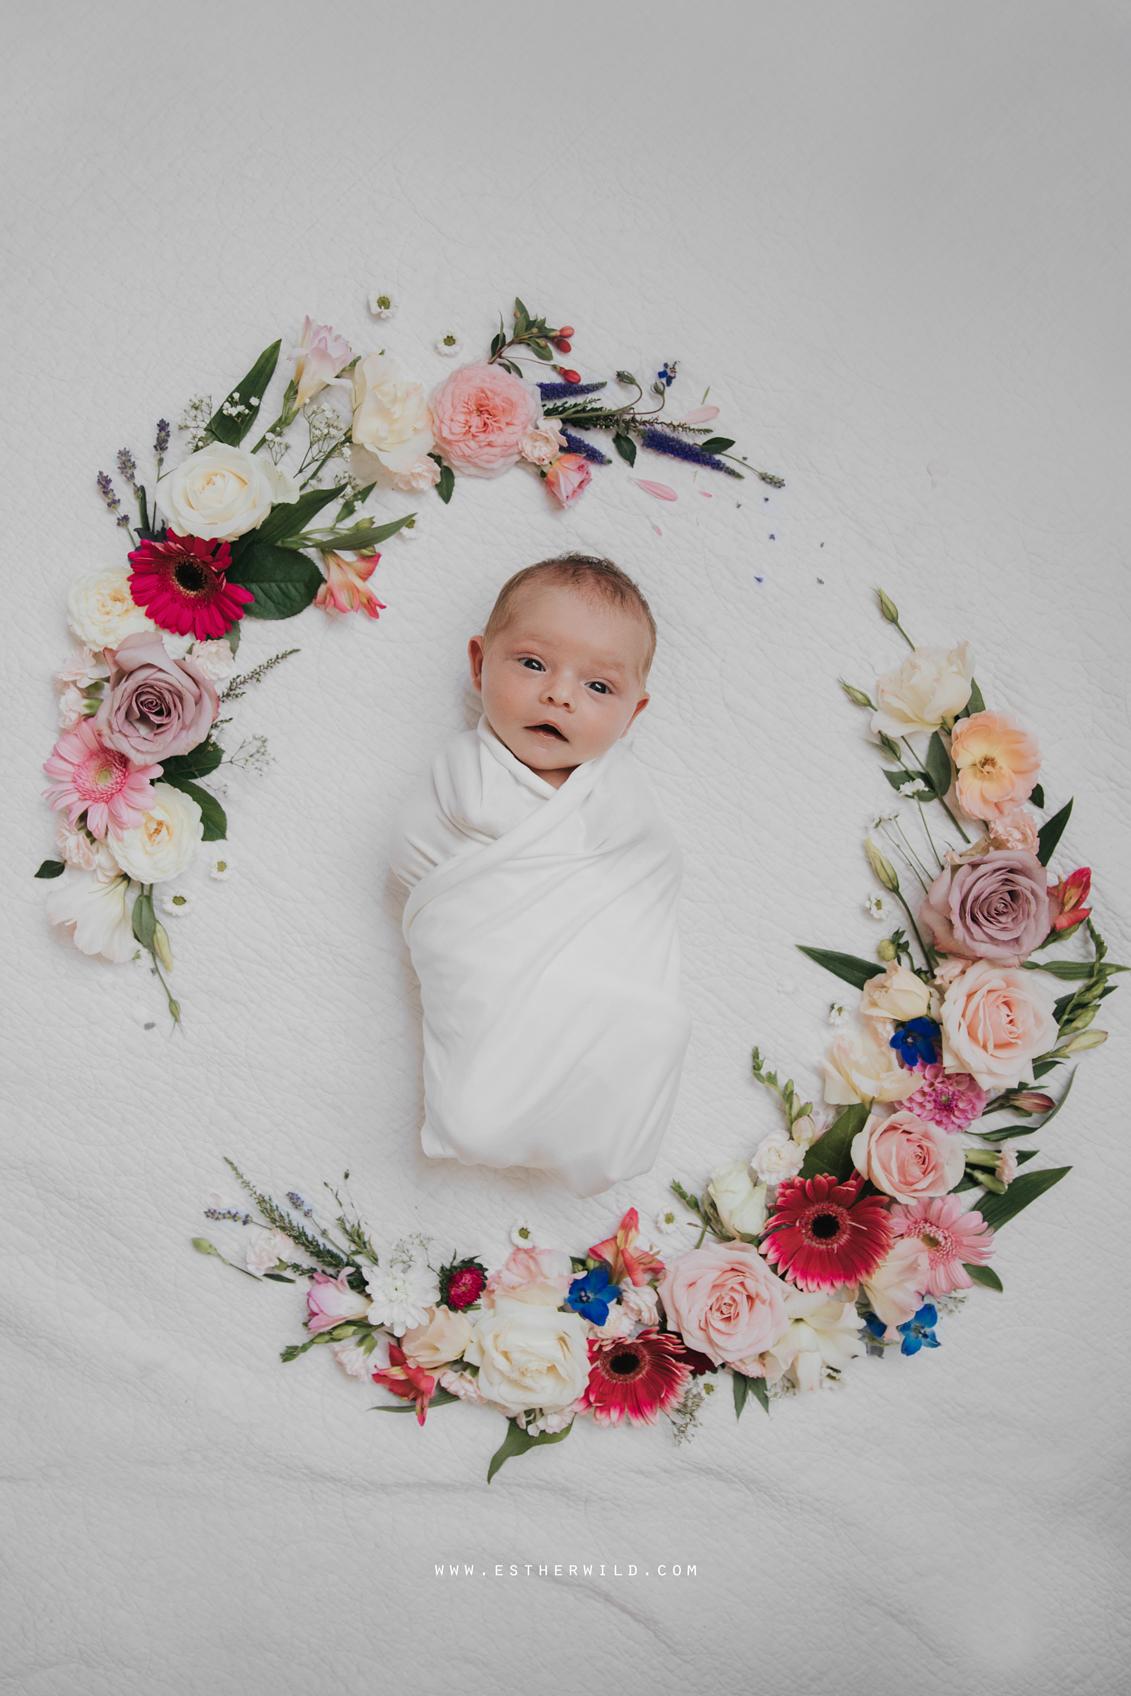 Newborn_Family_Photographer_Home_Norfolk_Newborn_Family_Photographer_Home_Norfolk_3R8A3743.jpg